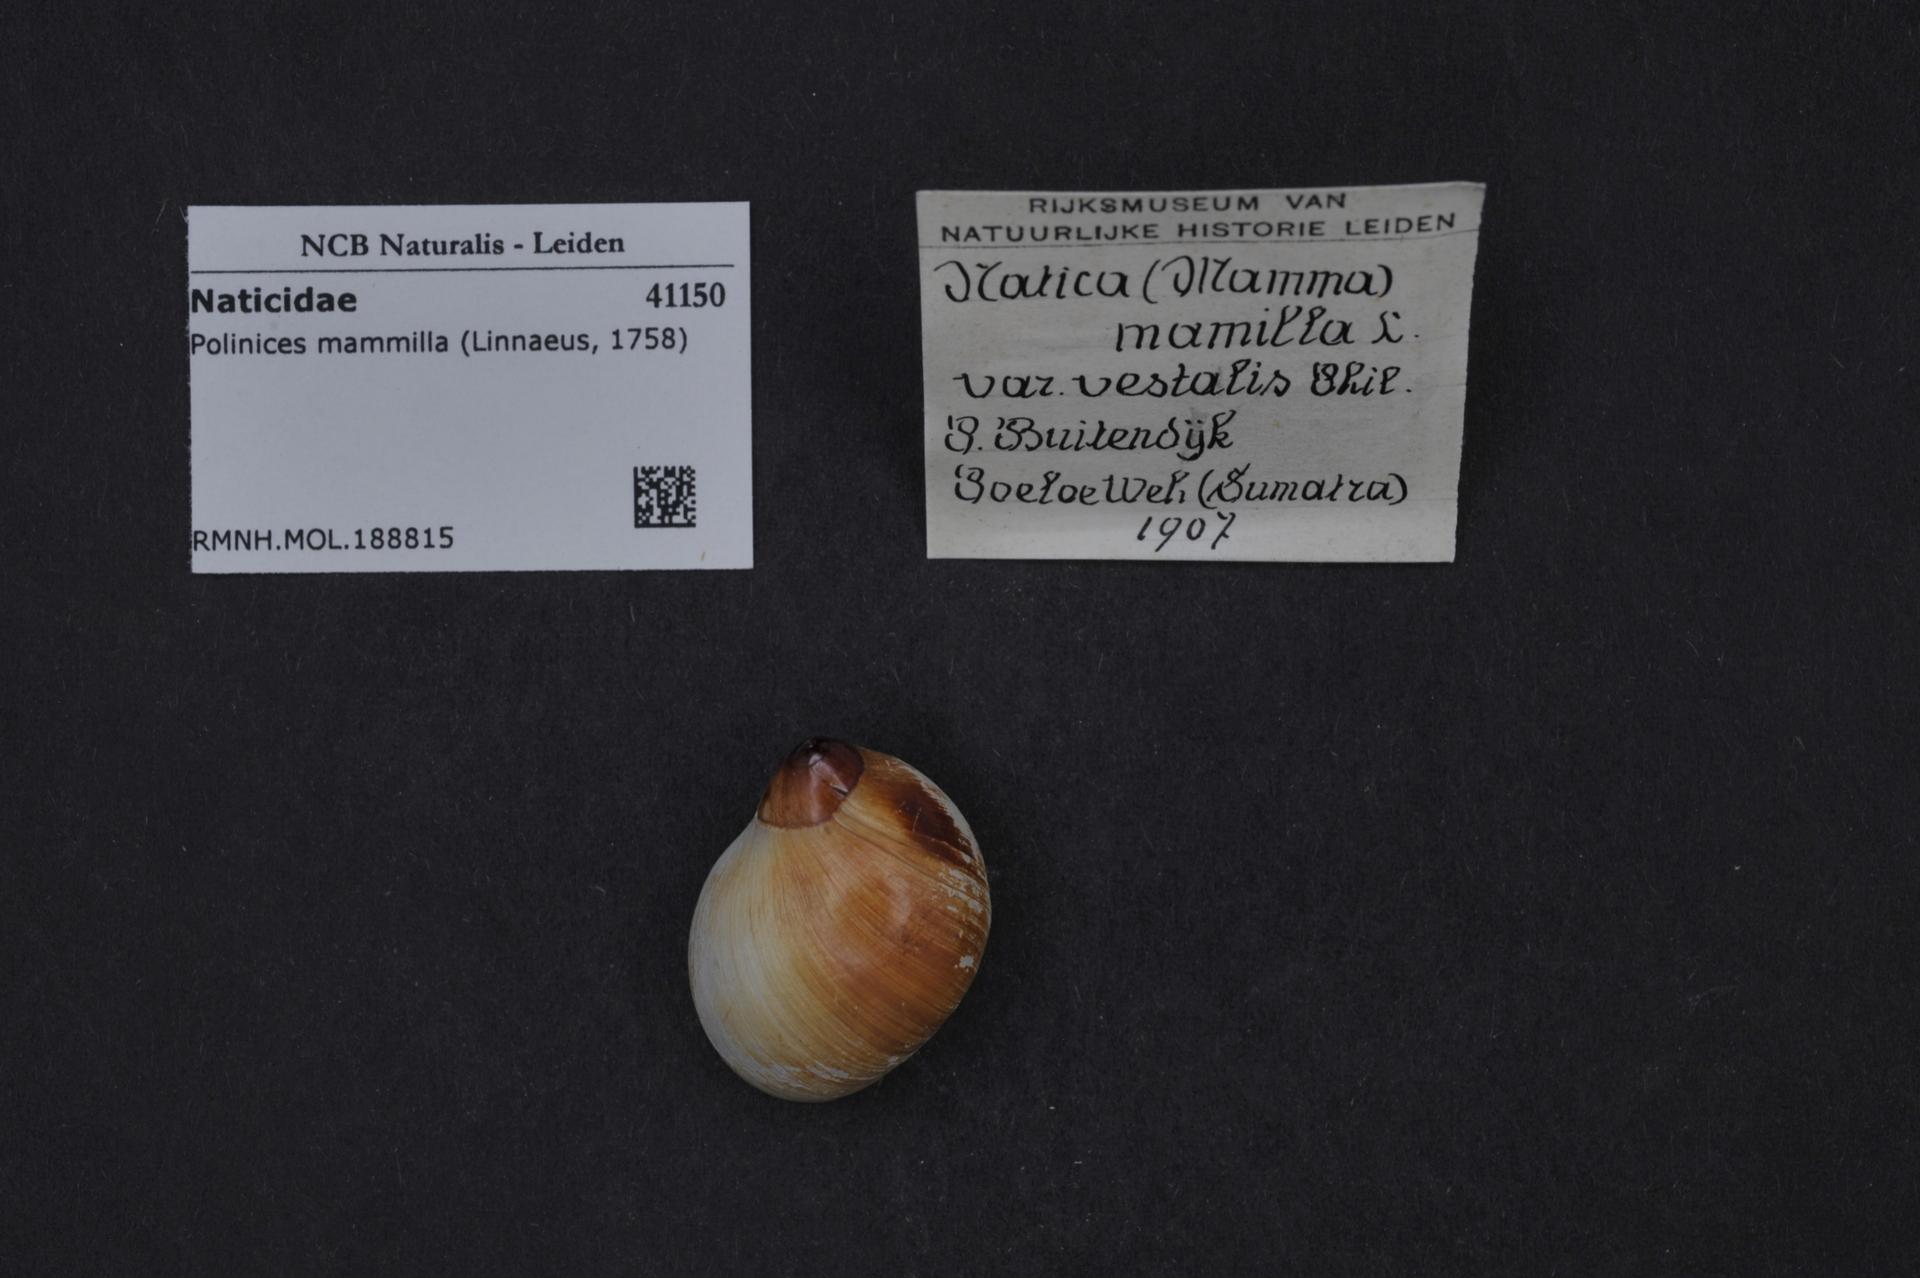 RMNH.MOL.188815 | Polinices mammilla (Linnaeus, 1758)